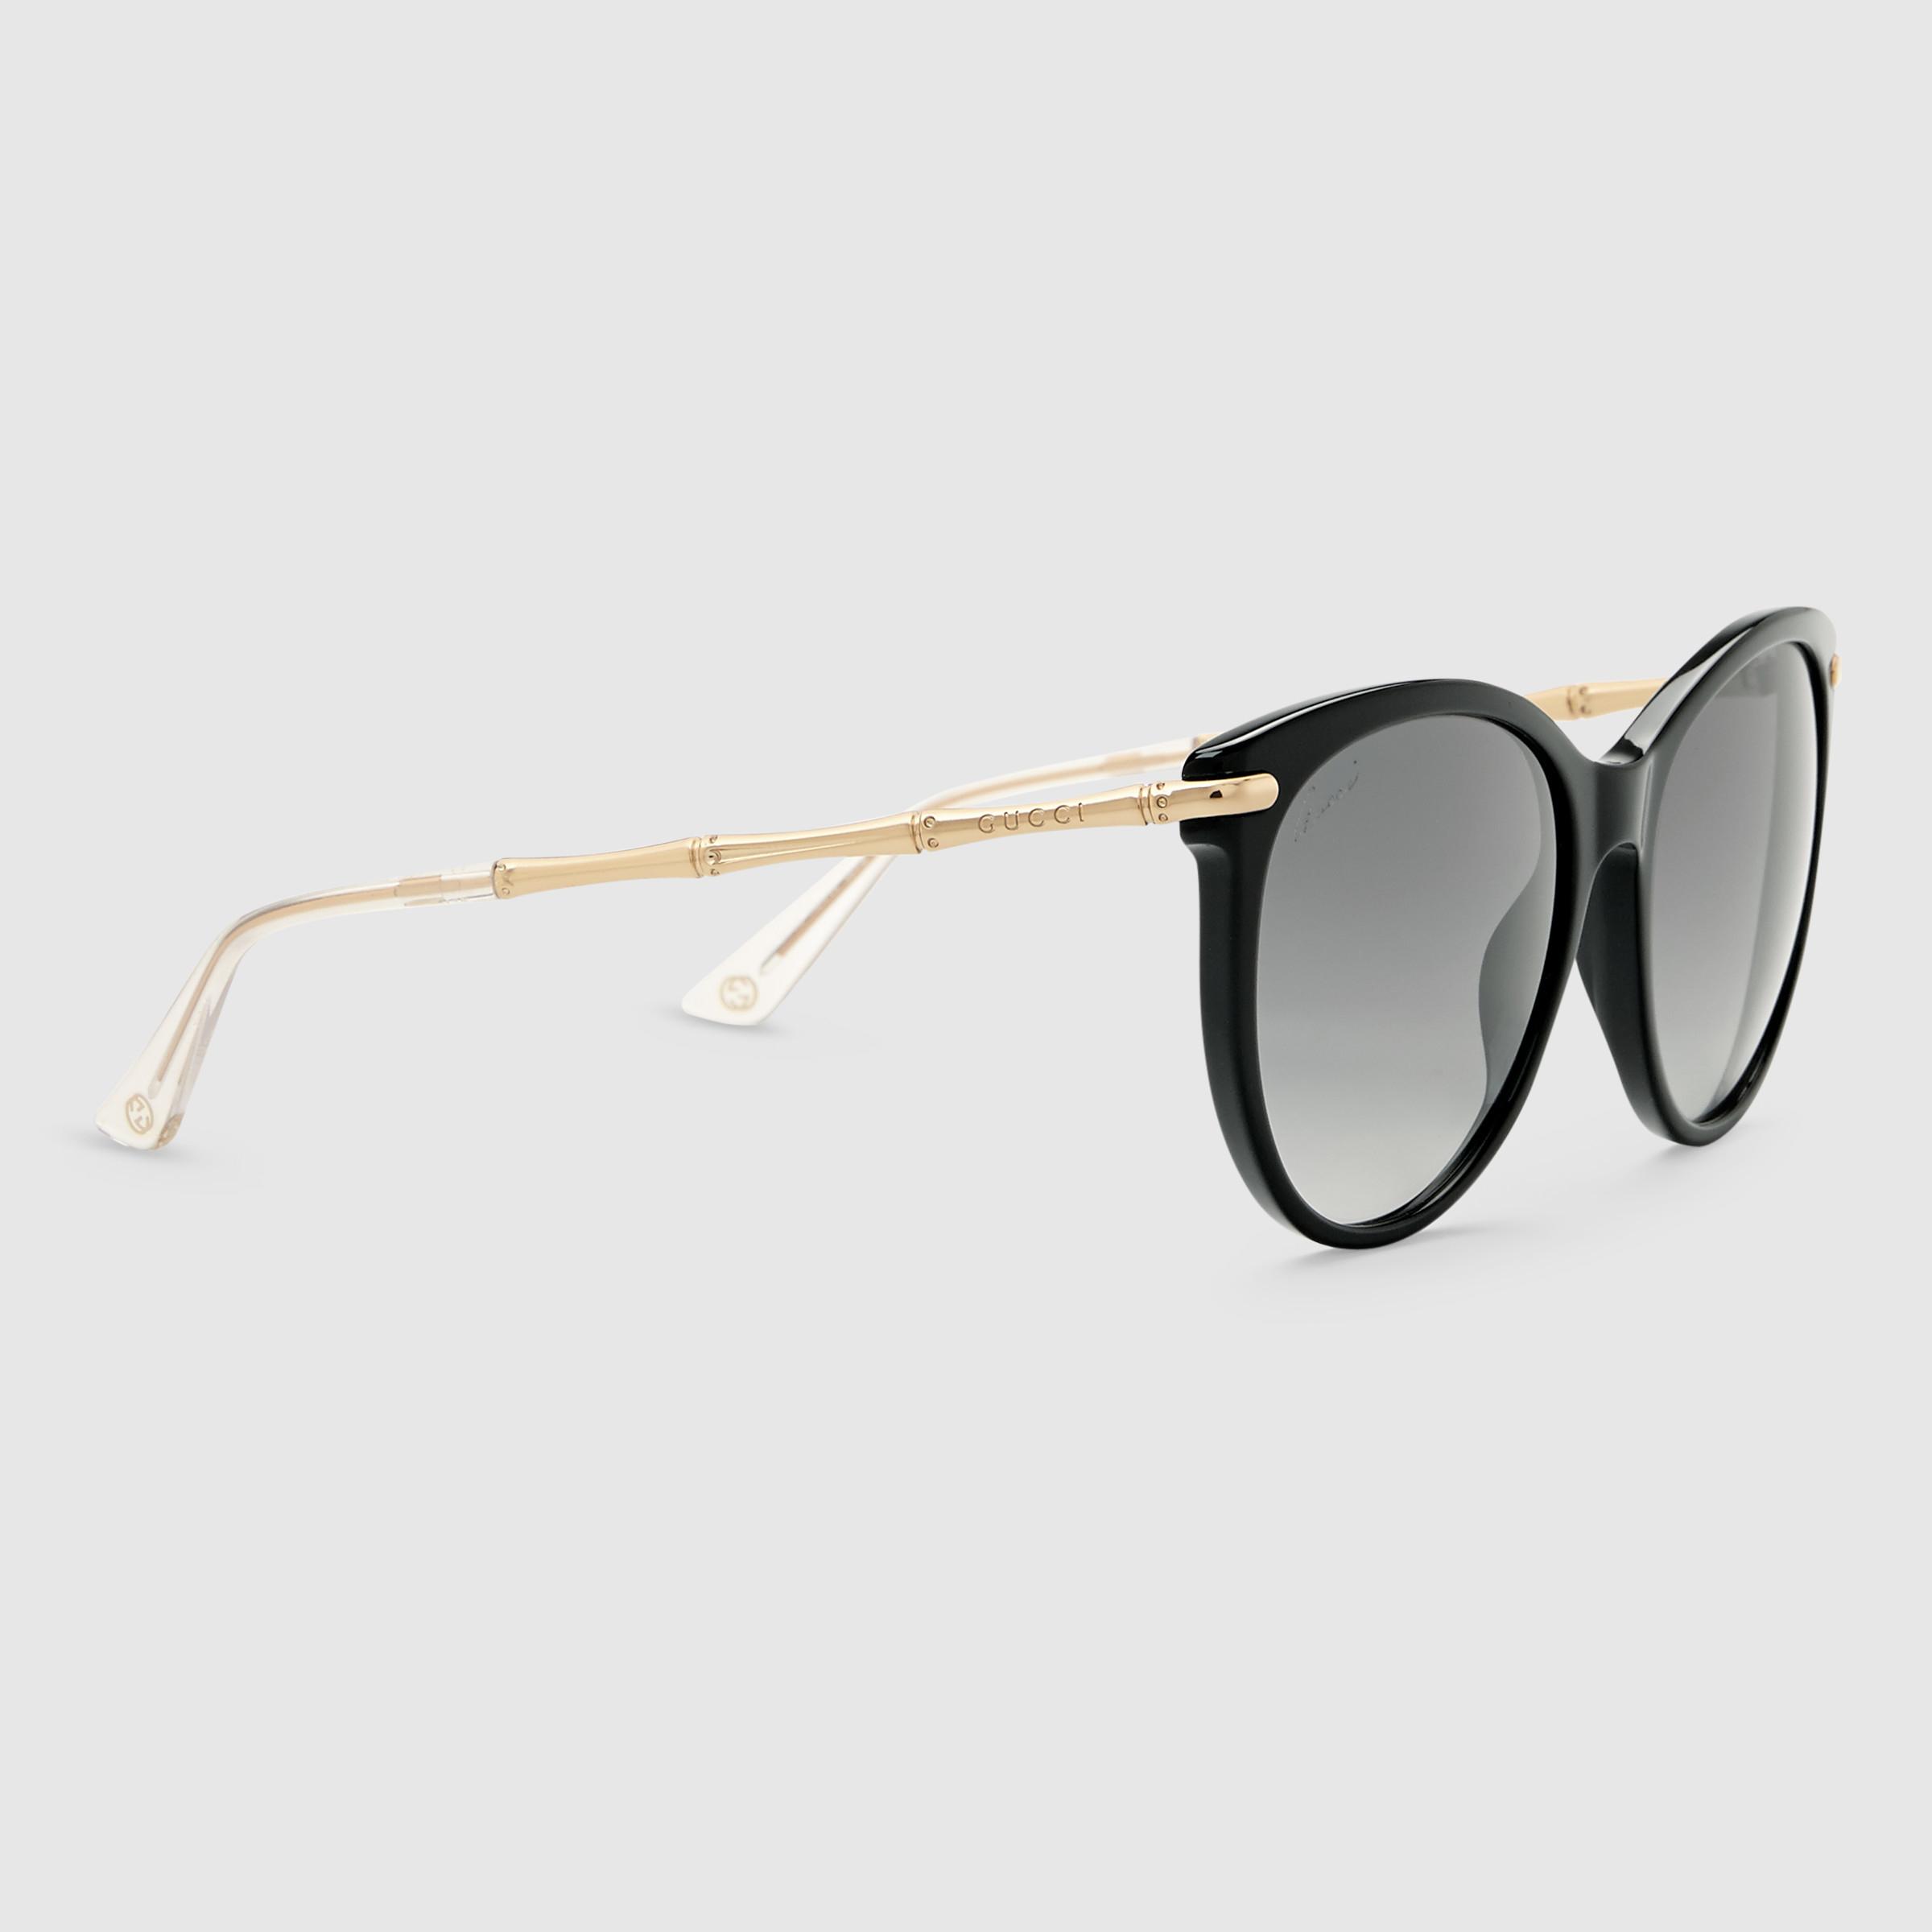 64057a0f12 Cartier Bamboo Eyeglasses-001